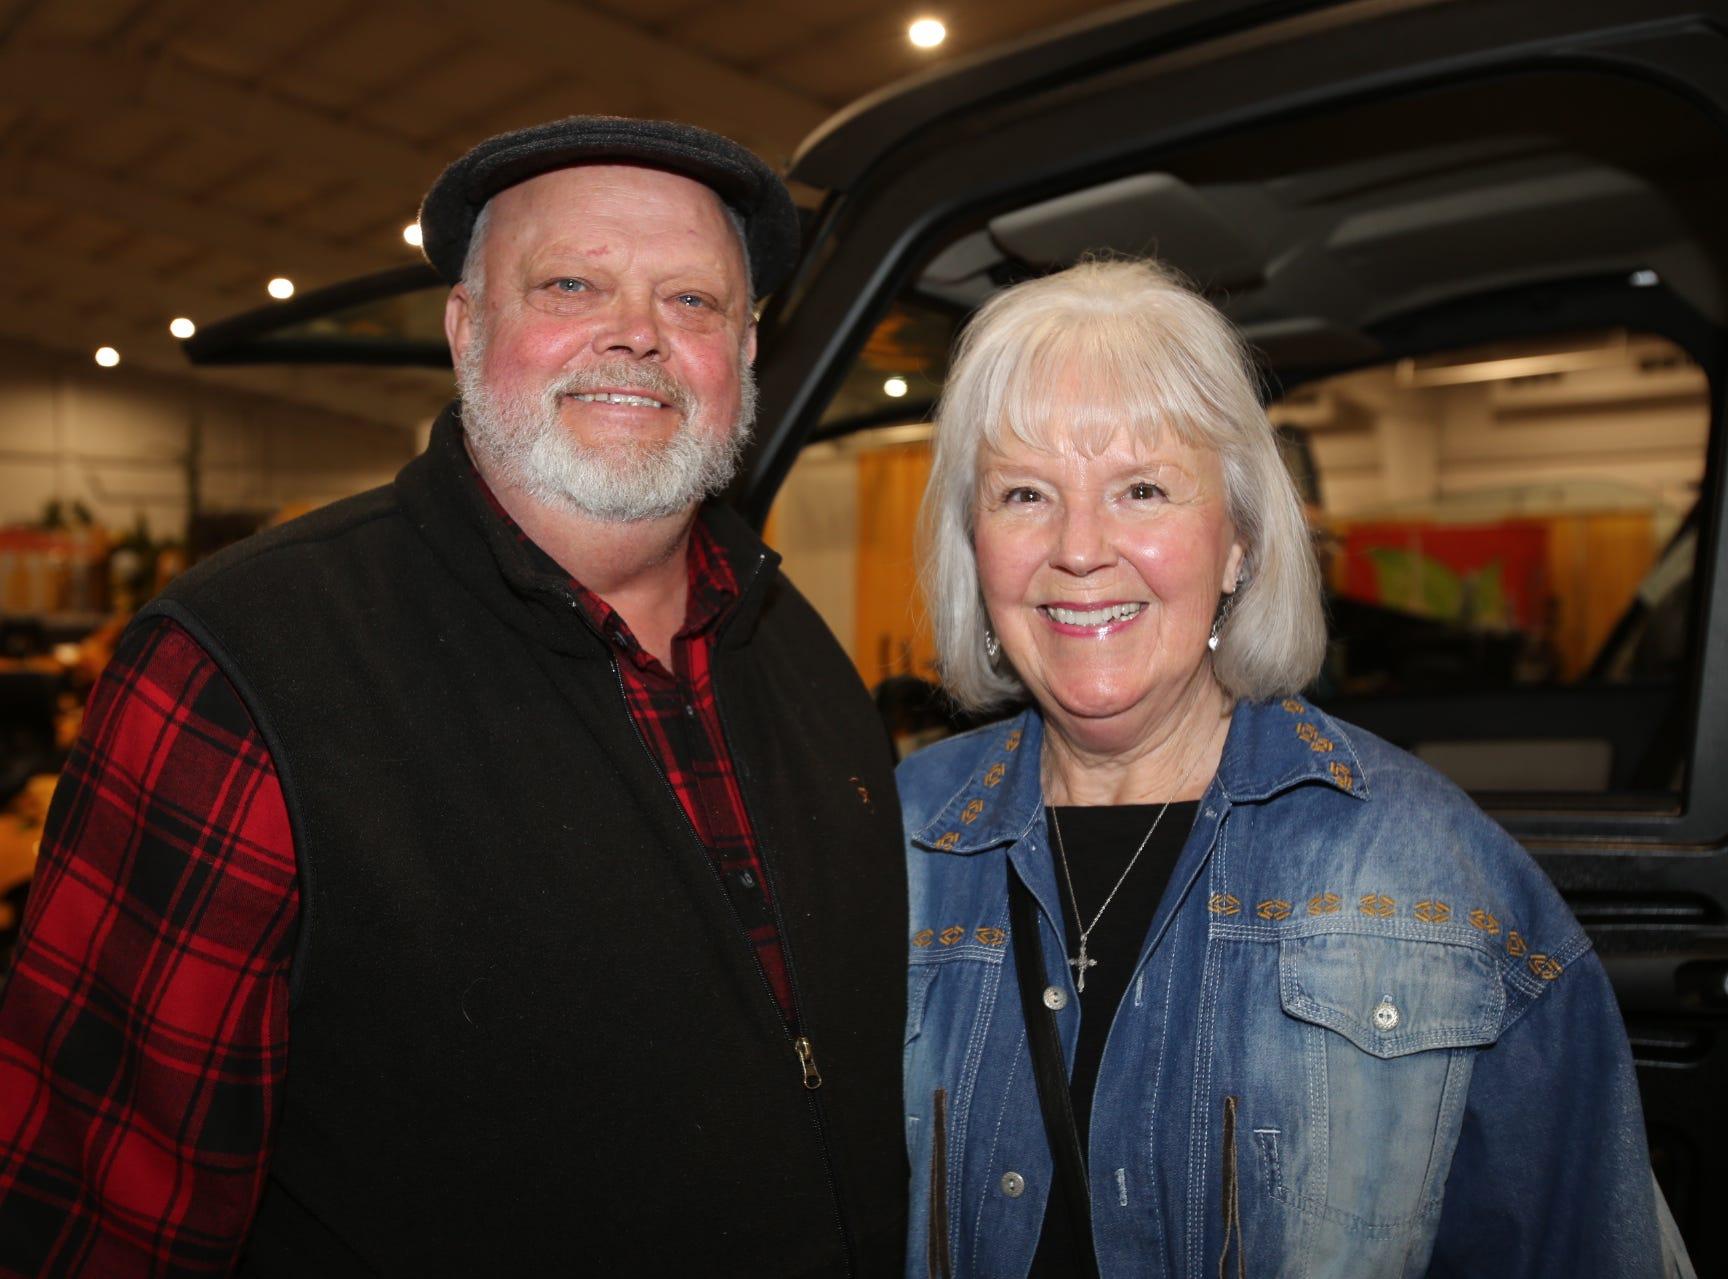 John and Susie Rummel